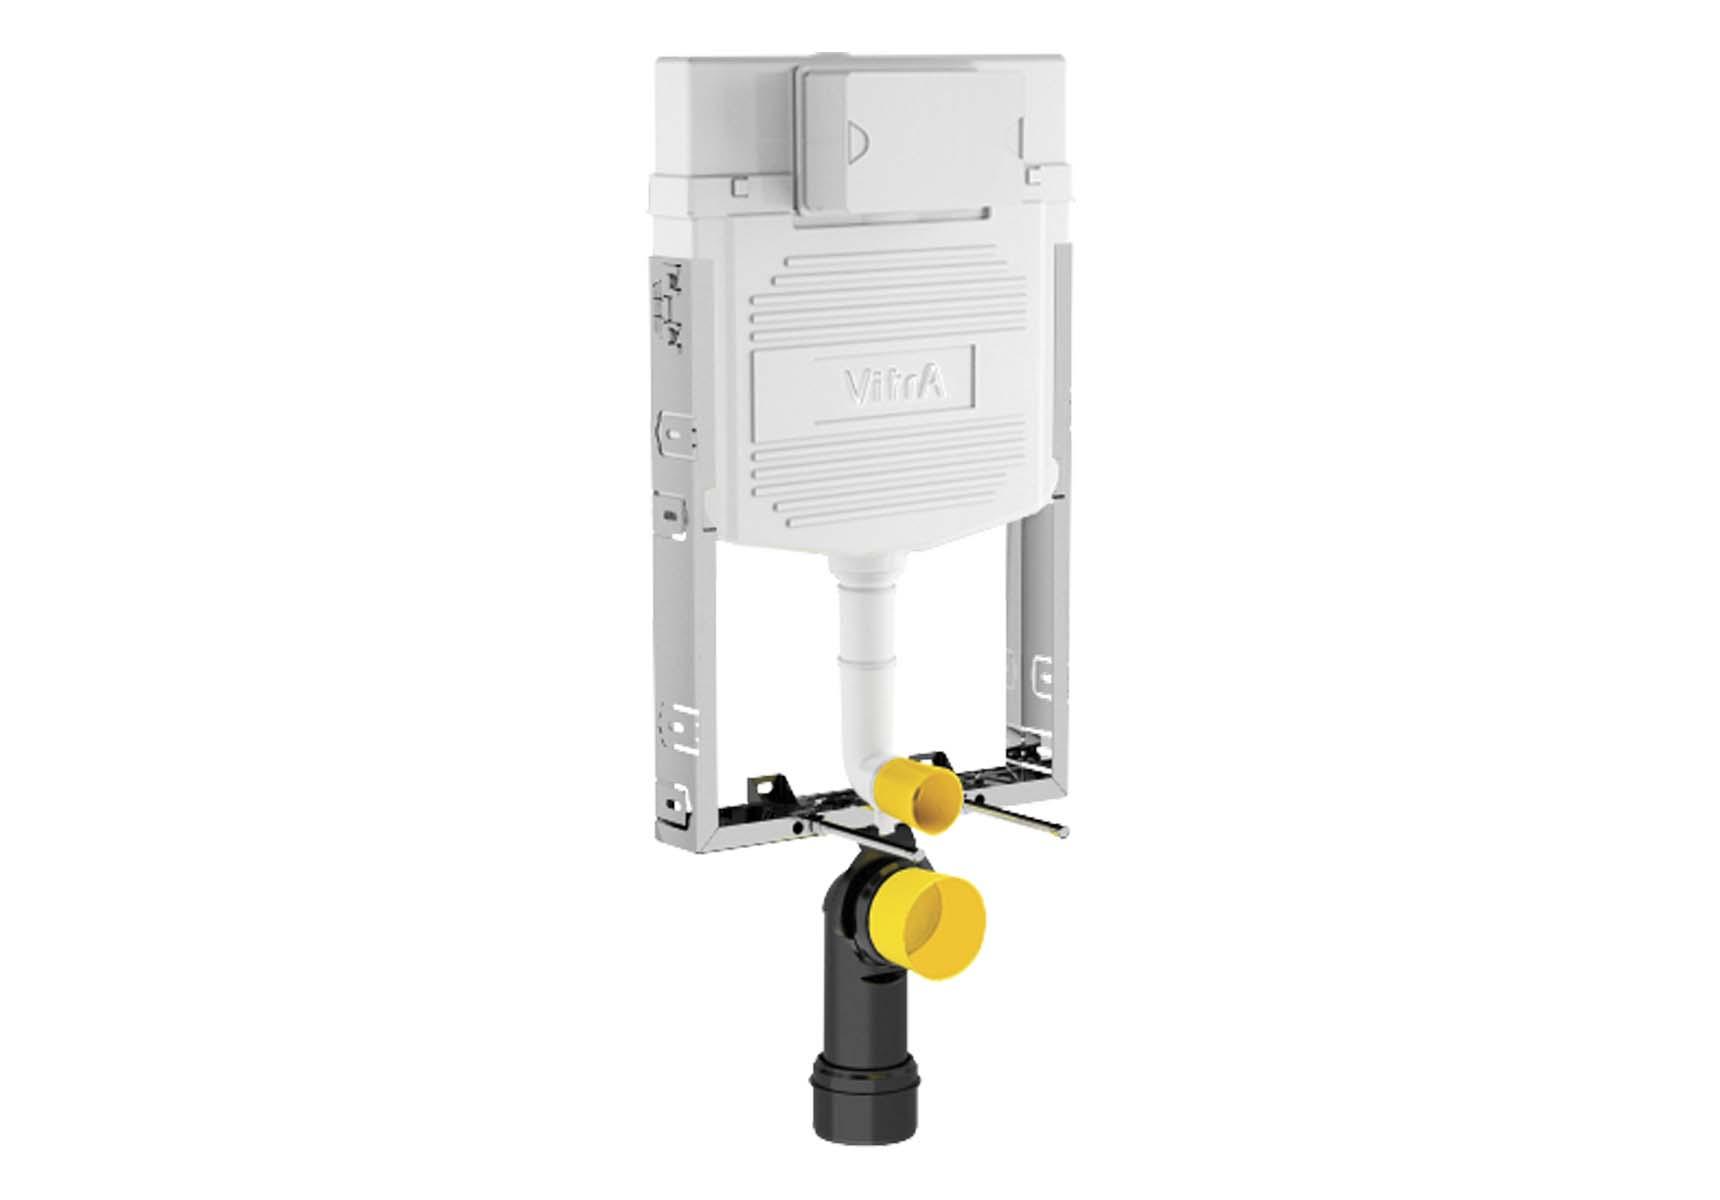 Standard Installation - 3/6 Liter Concealed Cistern Set (without metal brackets) - 8 cm